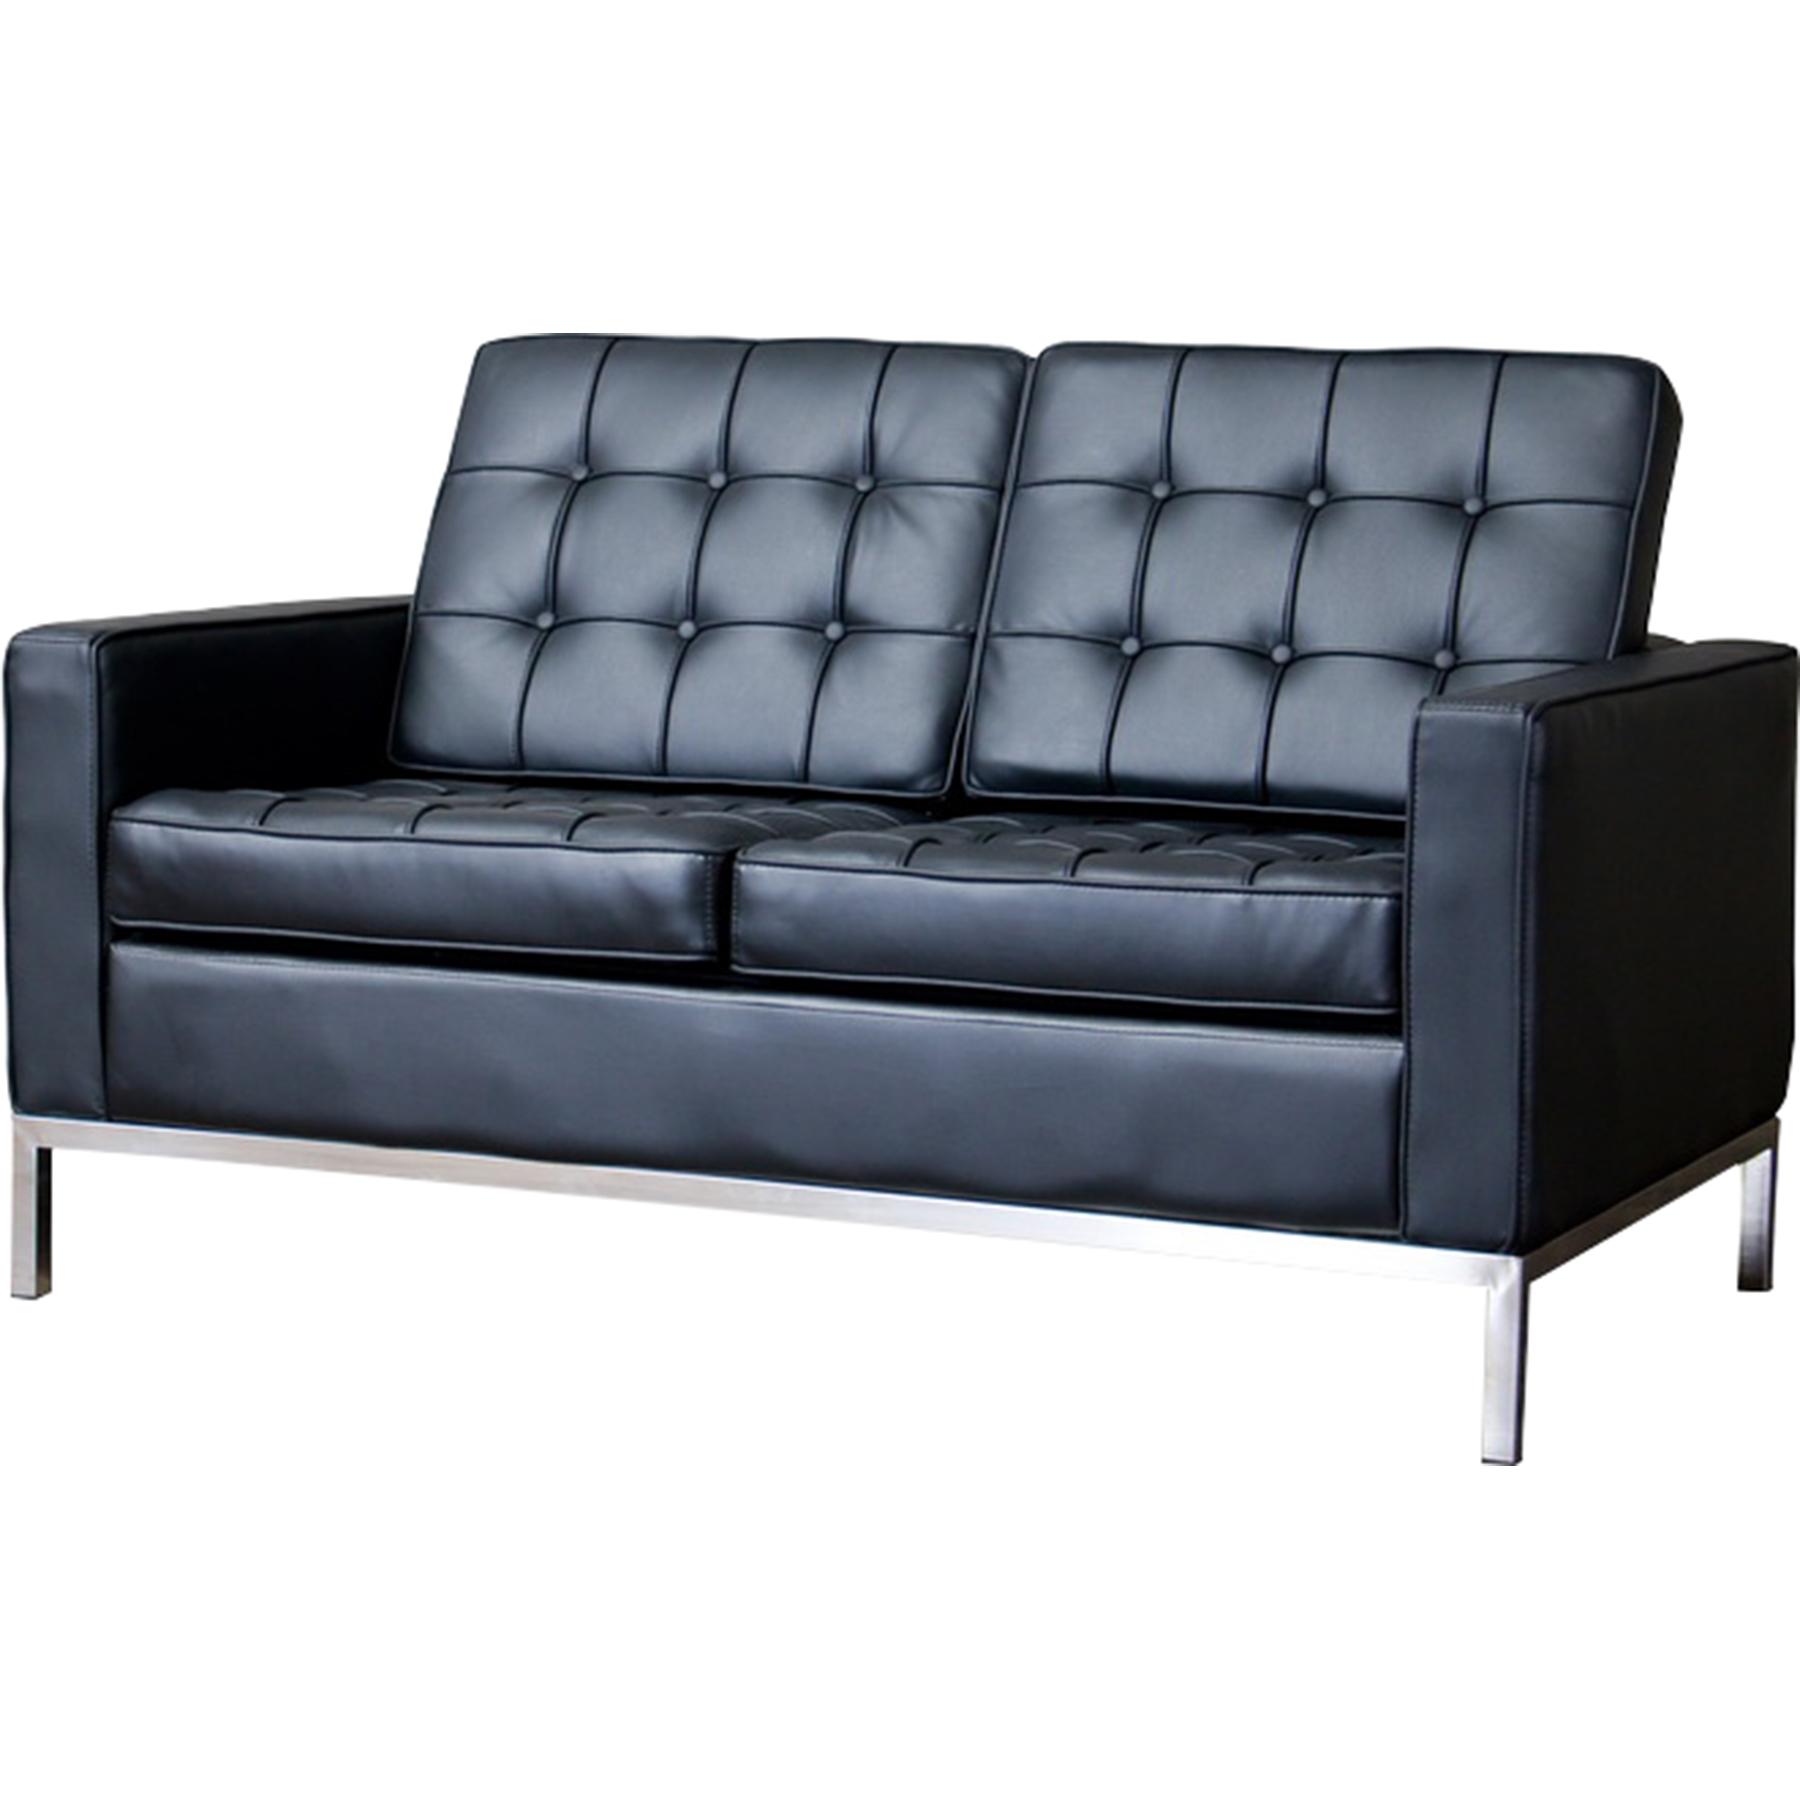 ... Connoisseur 3 Piece Living Room Sofa Set   Black   WI 810 BLACK ...